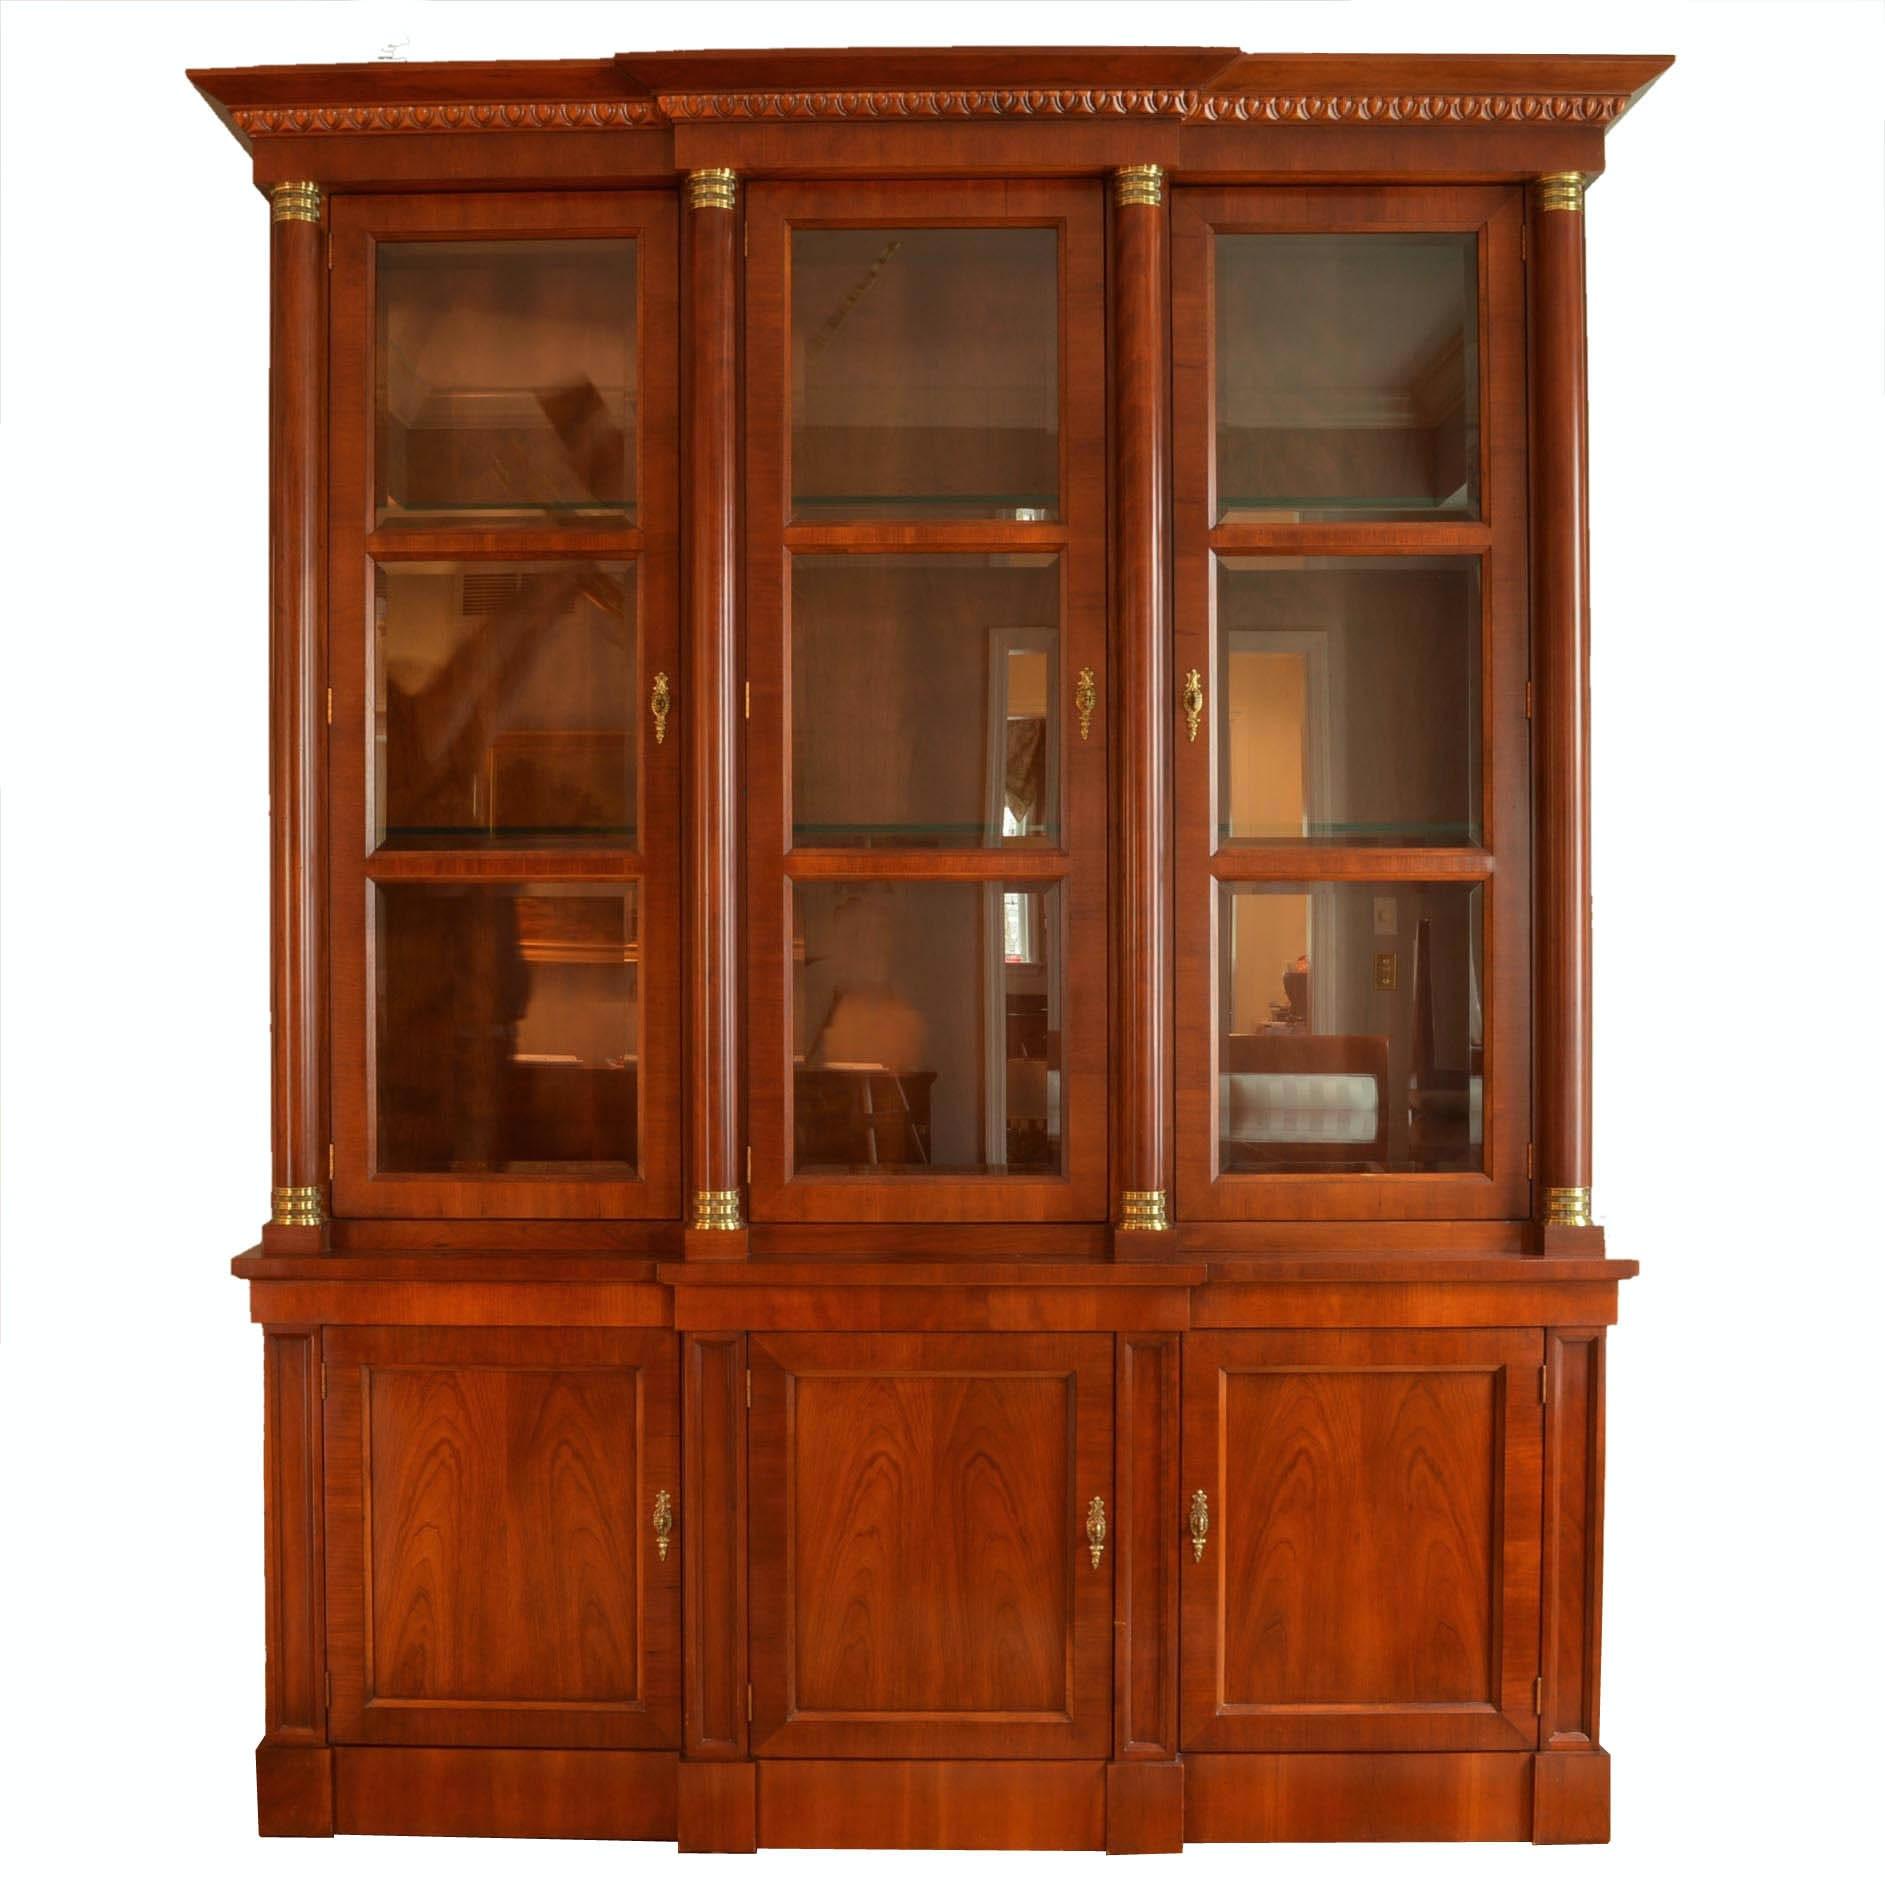 Baker Furniture U0027Palladian Collectionu0027 Breakfront Cabinet ...